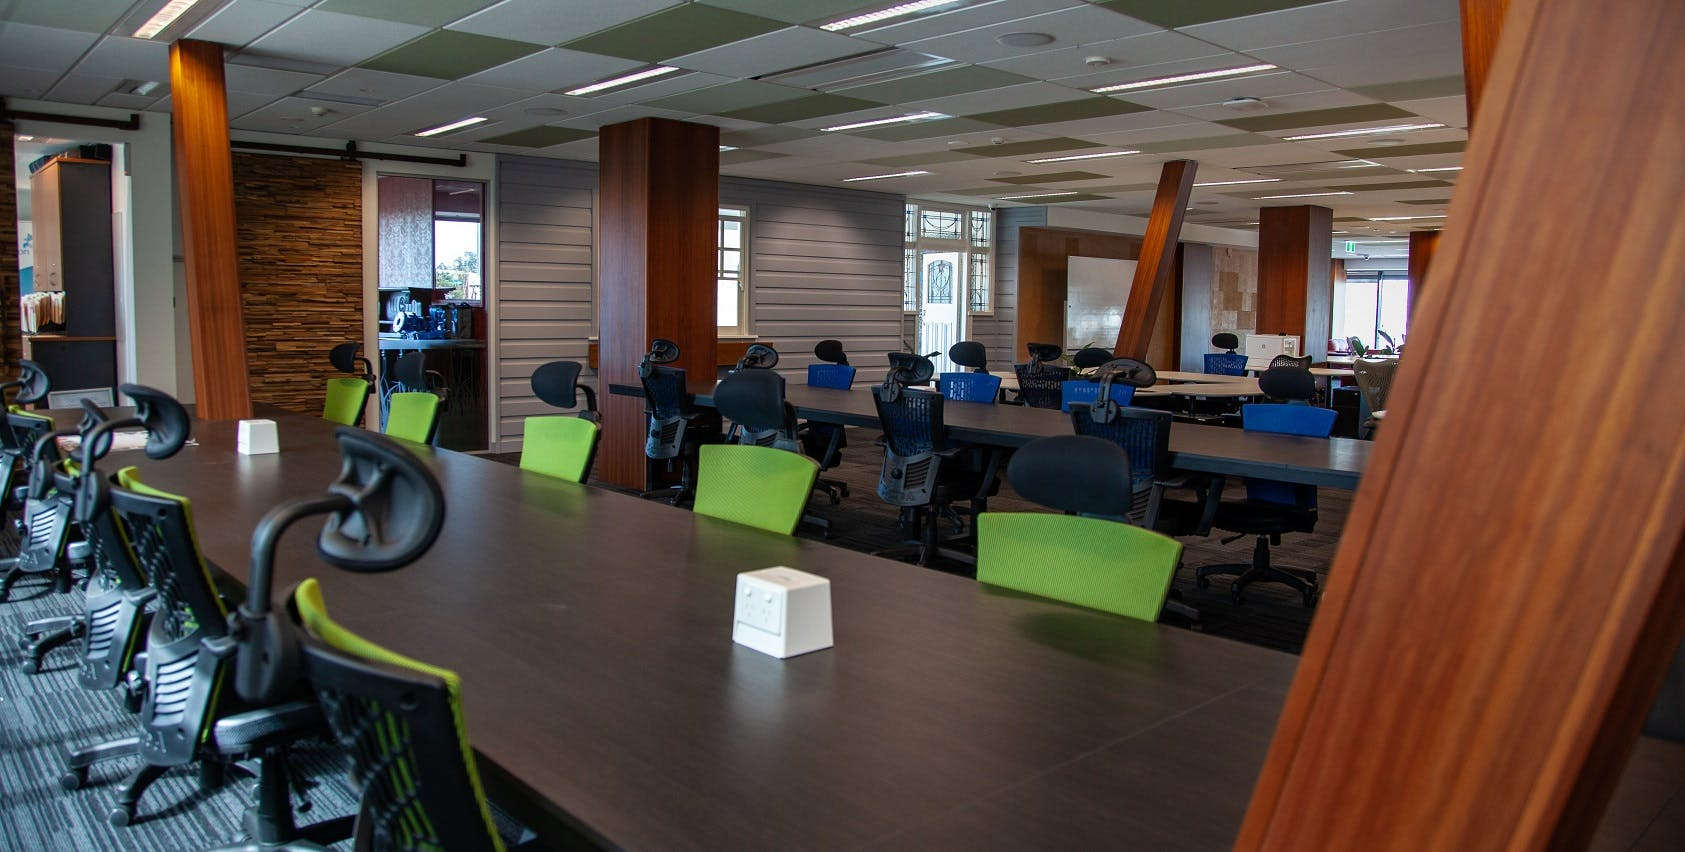 Coworking, hot desk at Officenexus, image 1